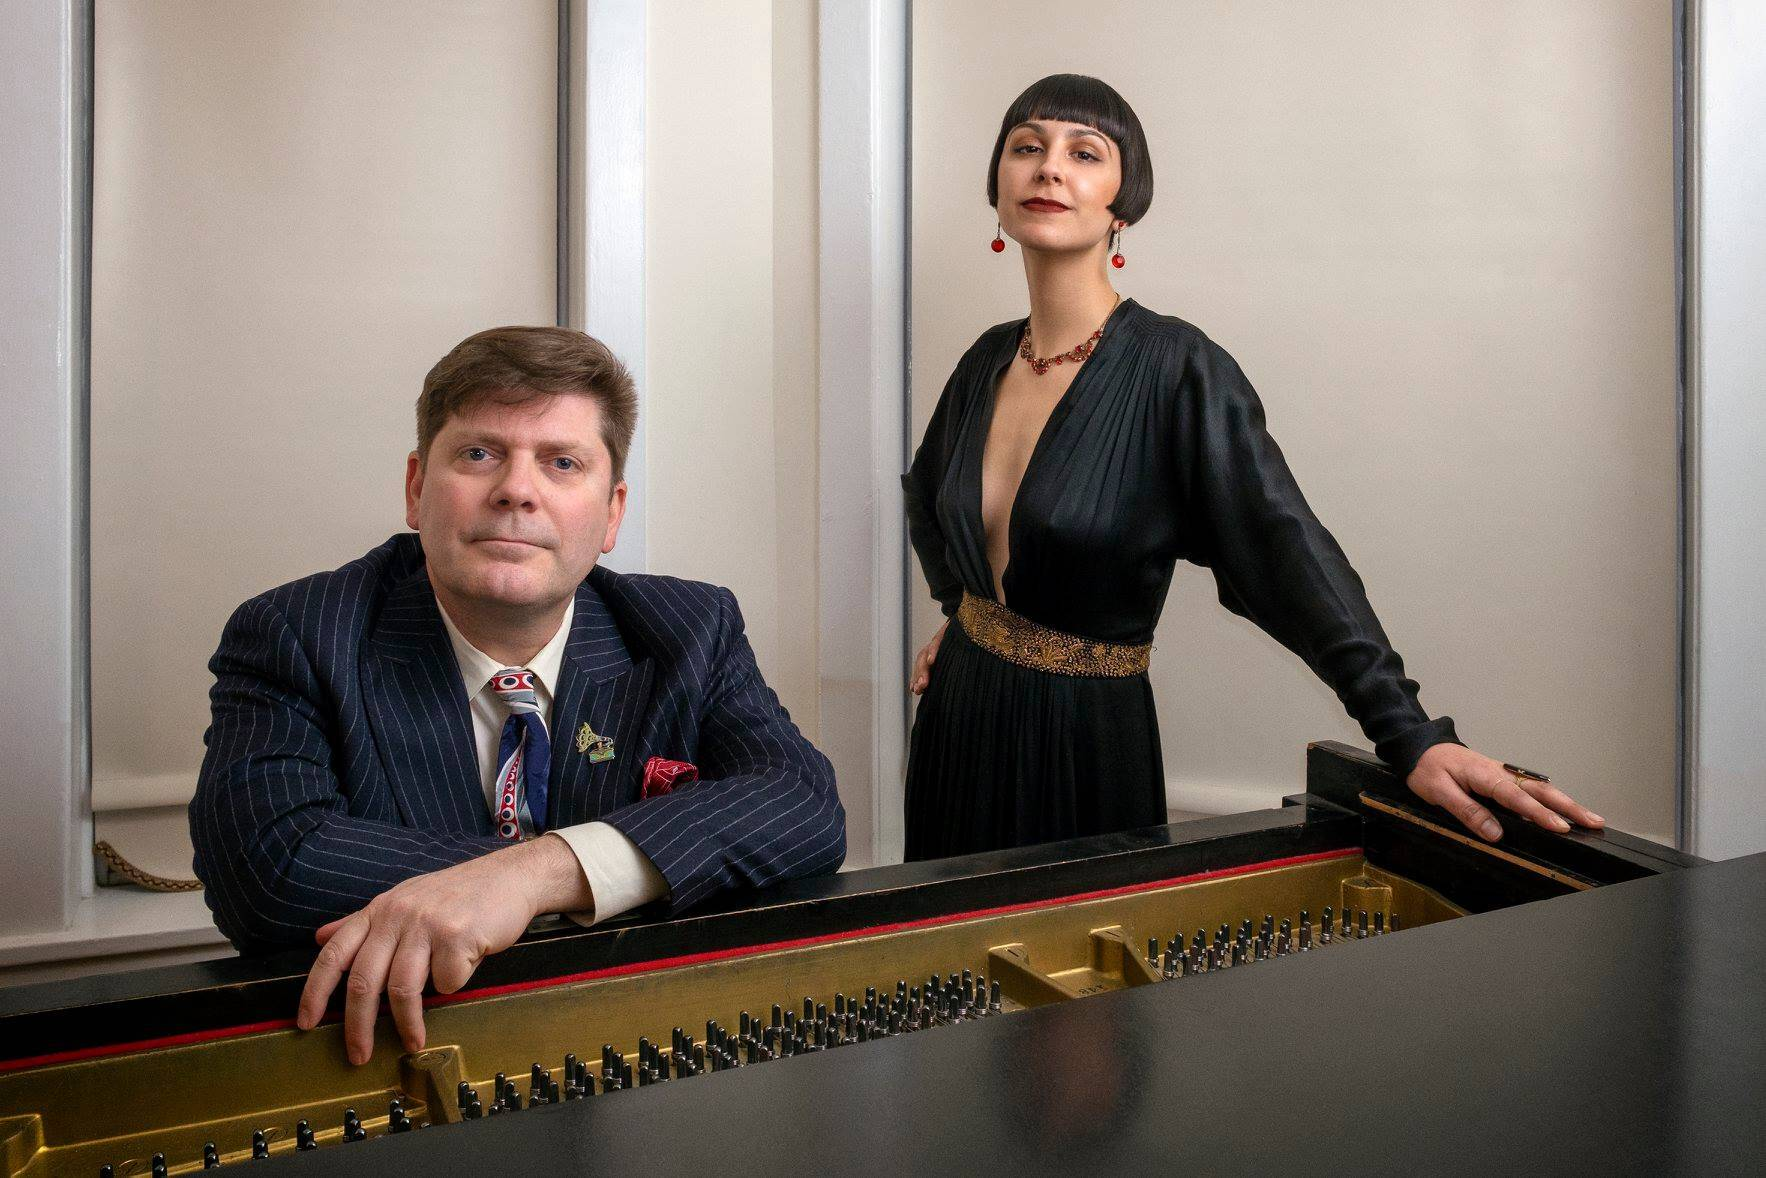 Roya Naldi & Paul Asaro